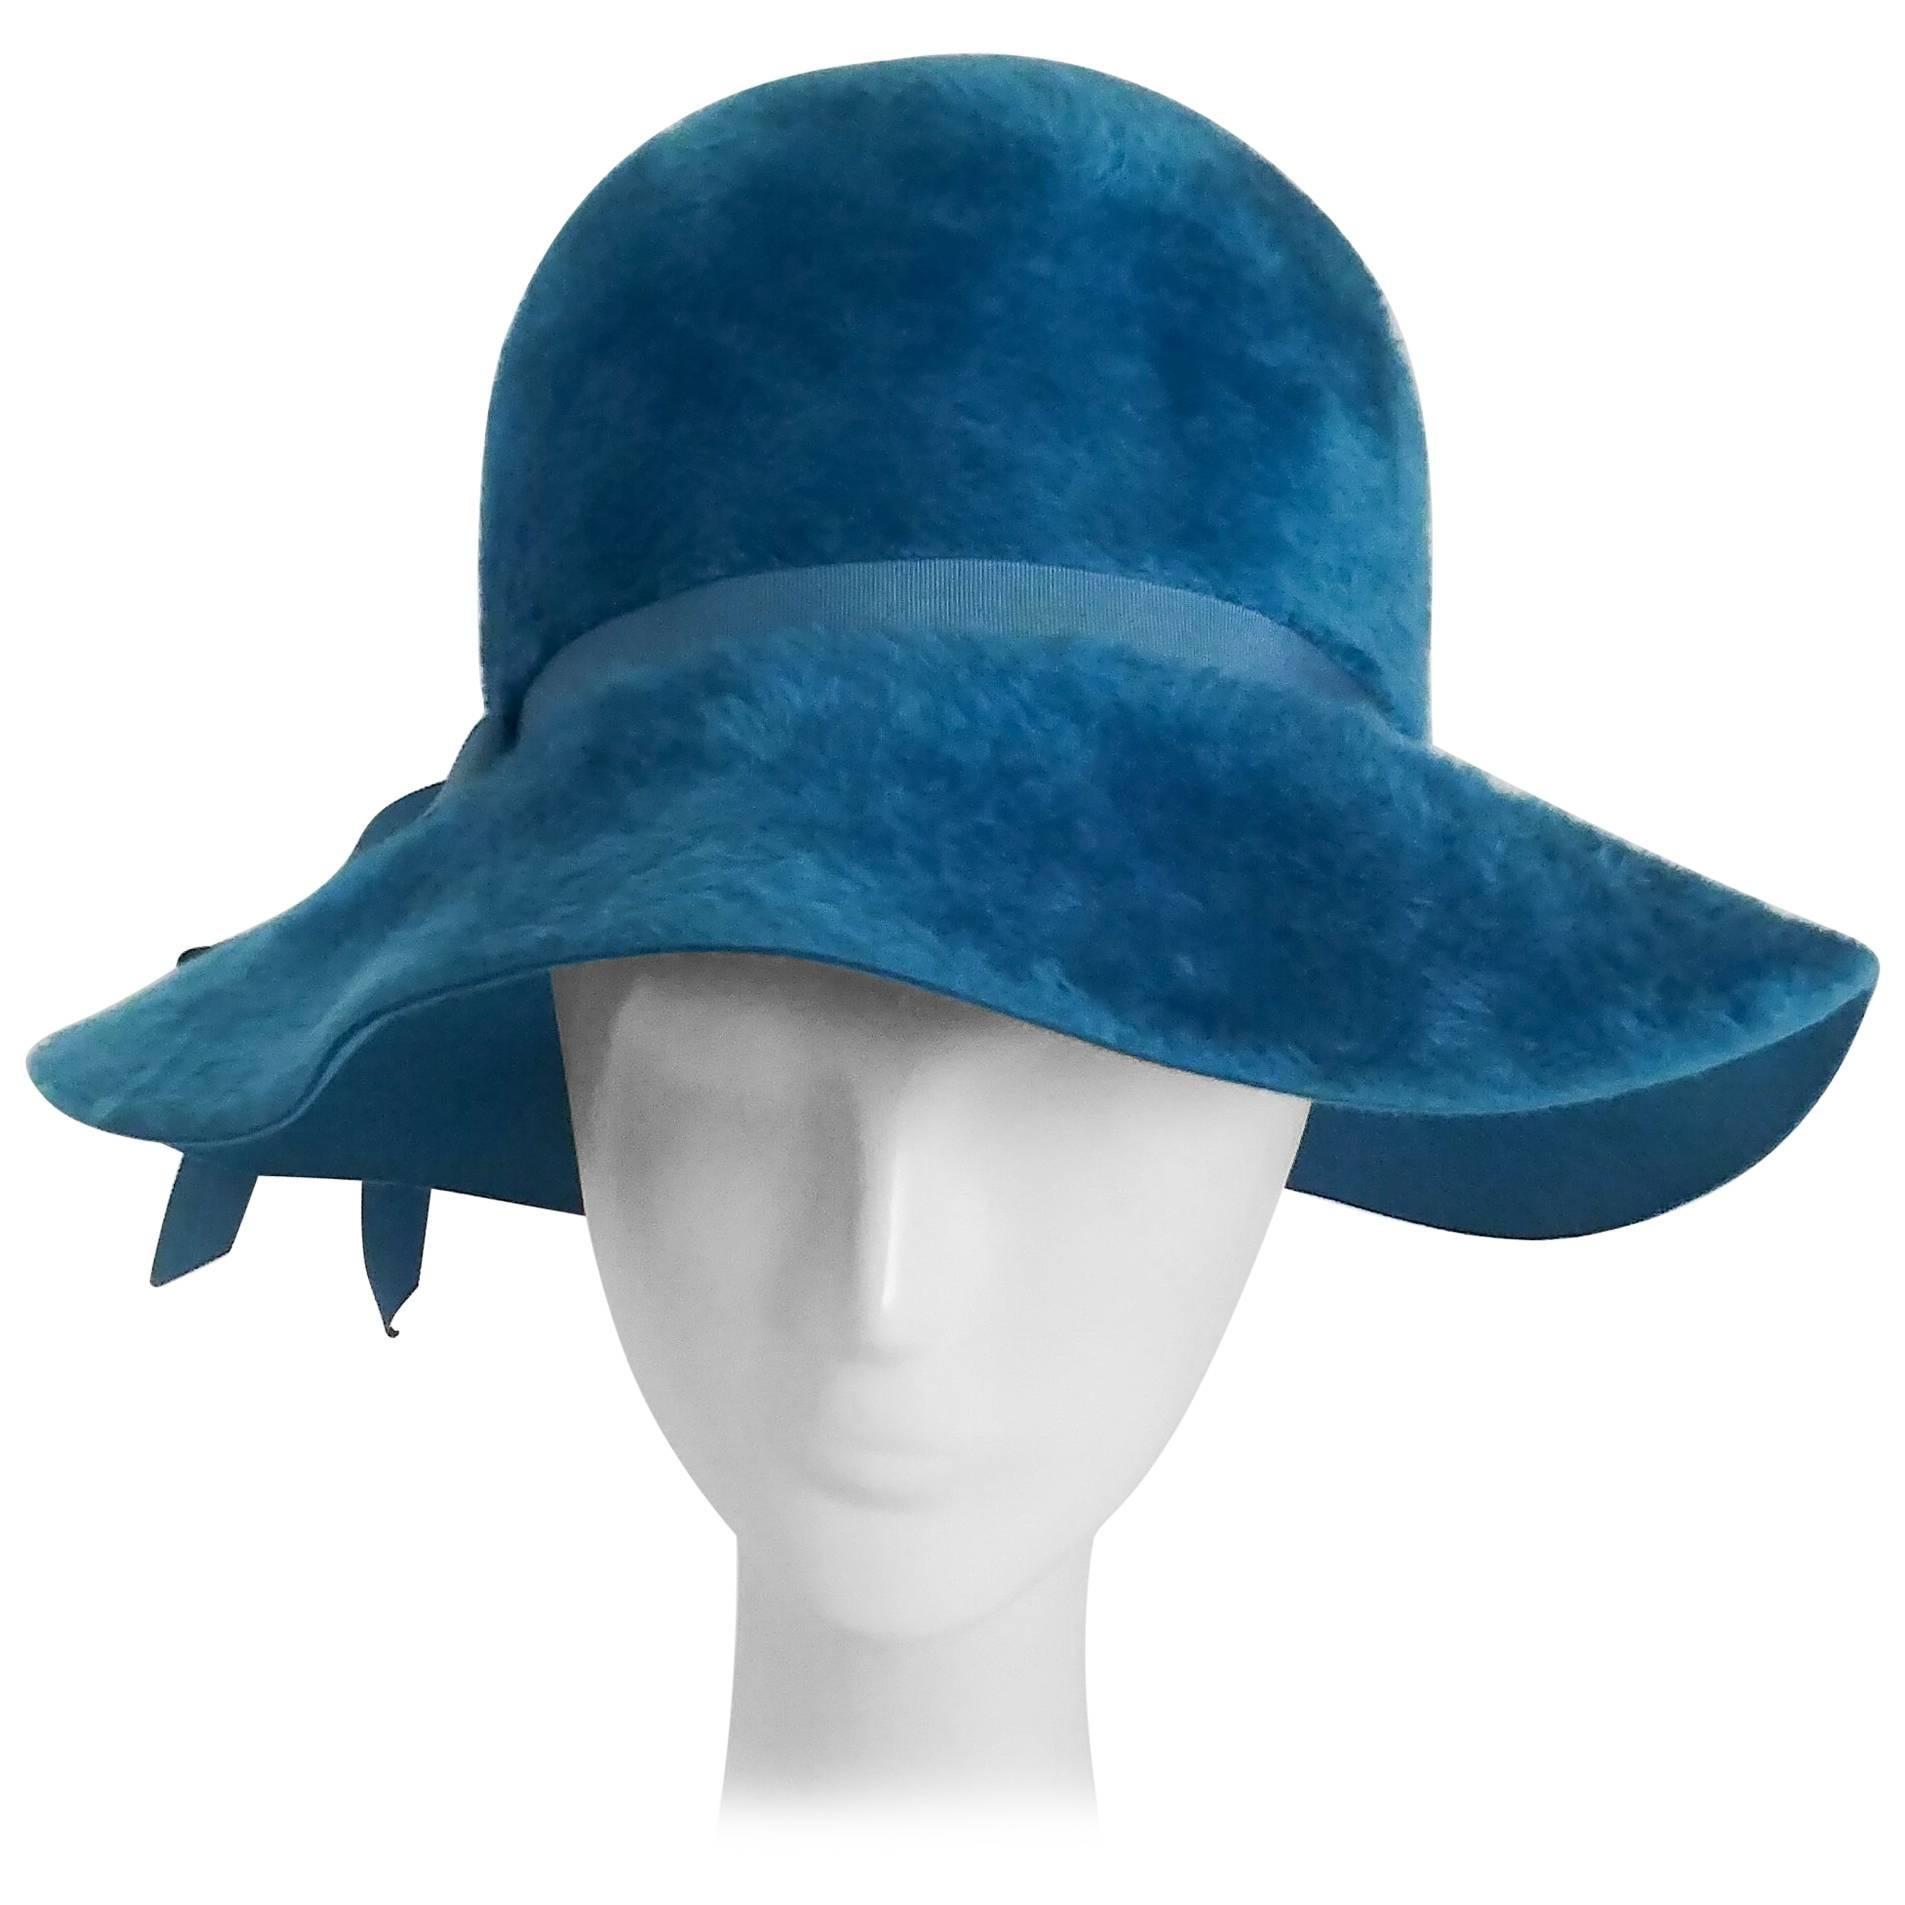 1960s Cerulean Blue Felt Wide Brim Floppy Hat